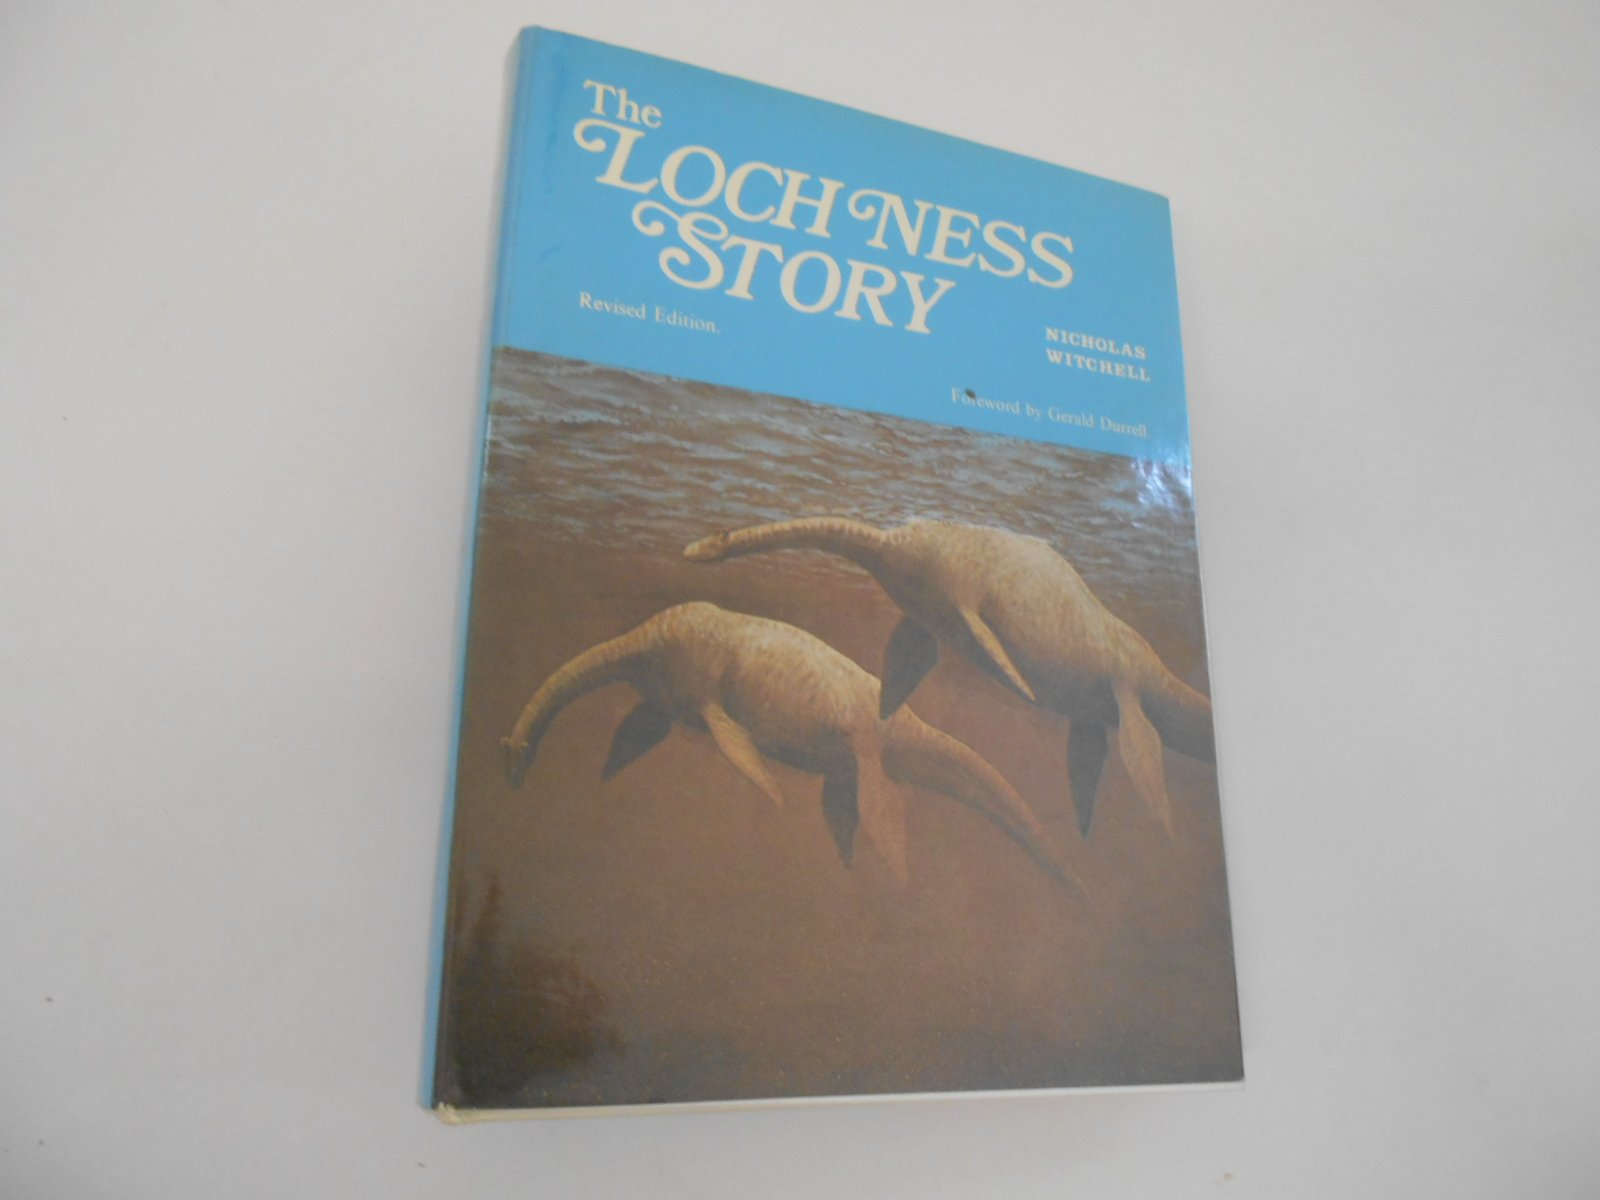 Loch Ness Story Witchell Nicholas 9780900963681 Amazon Com Books